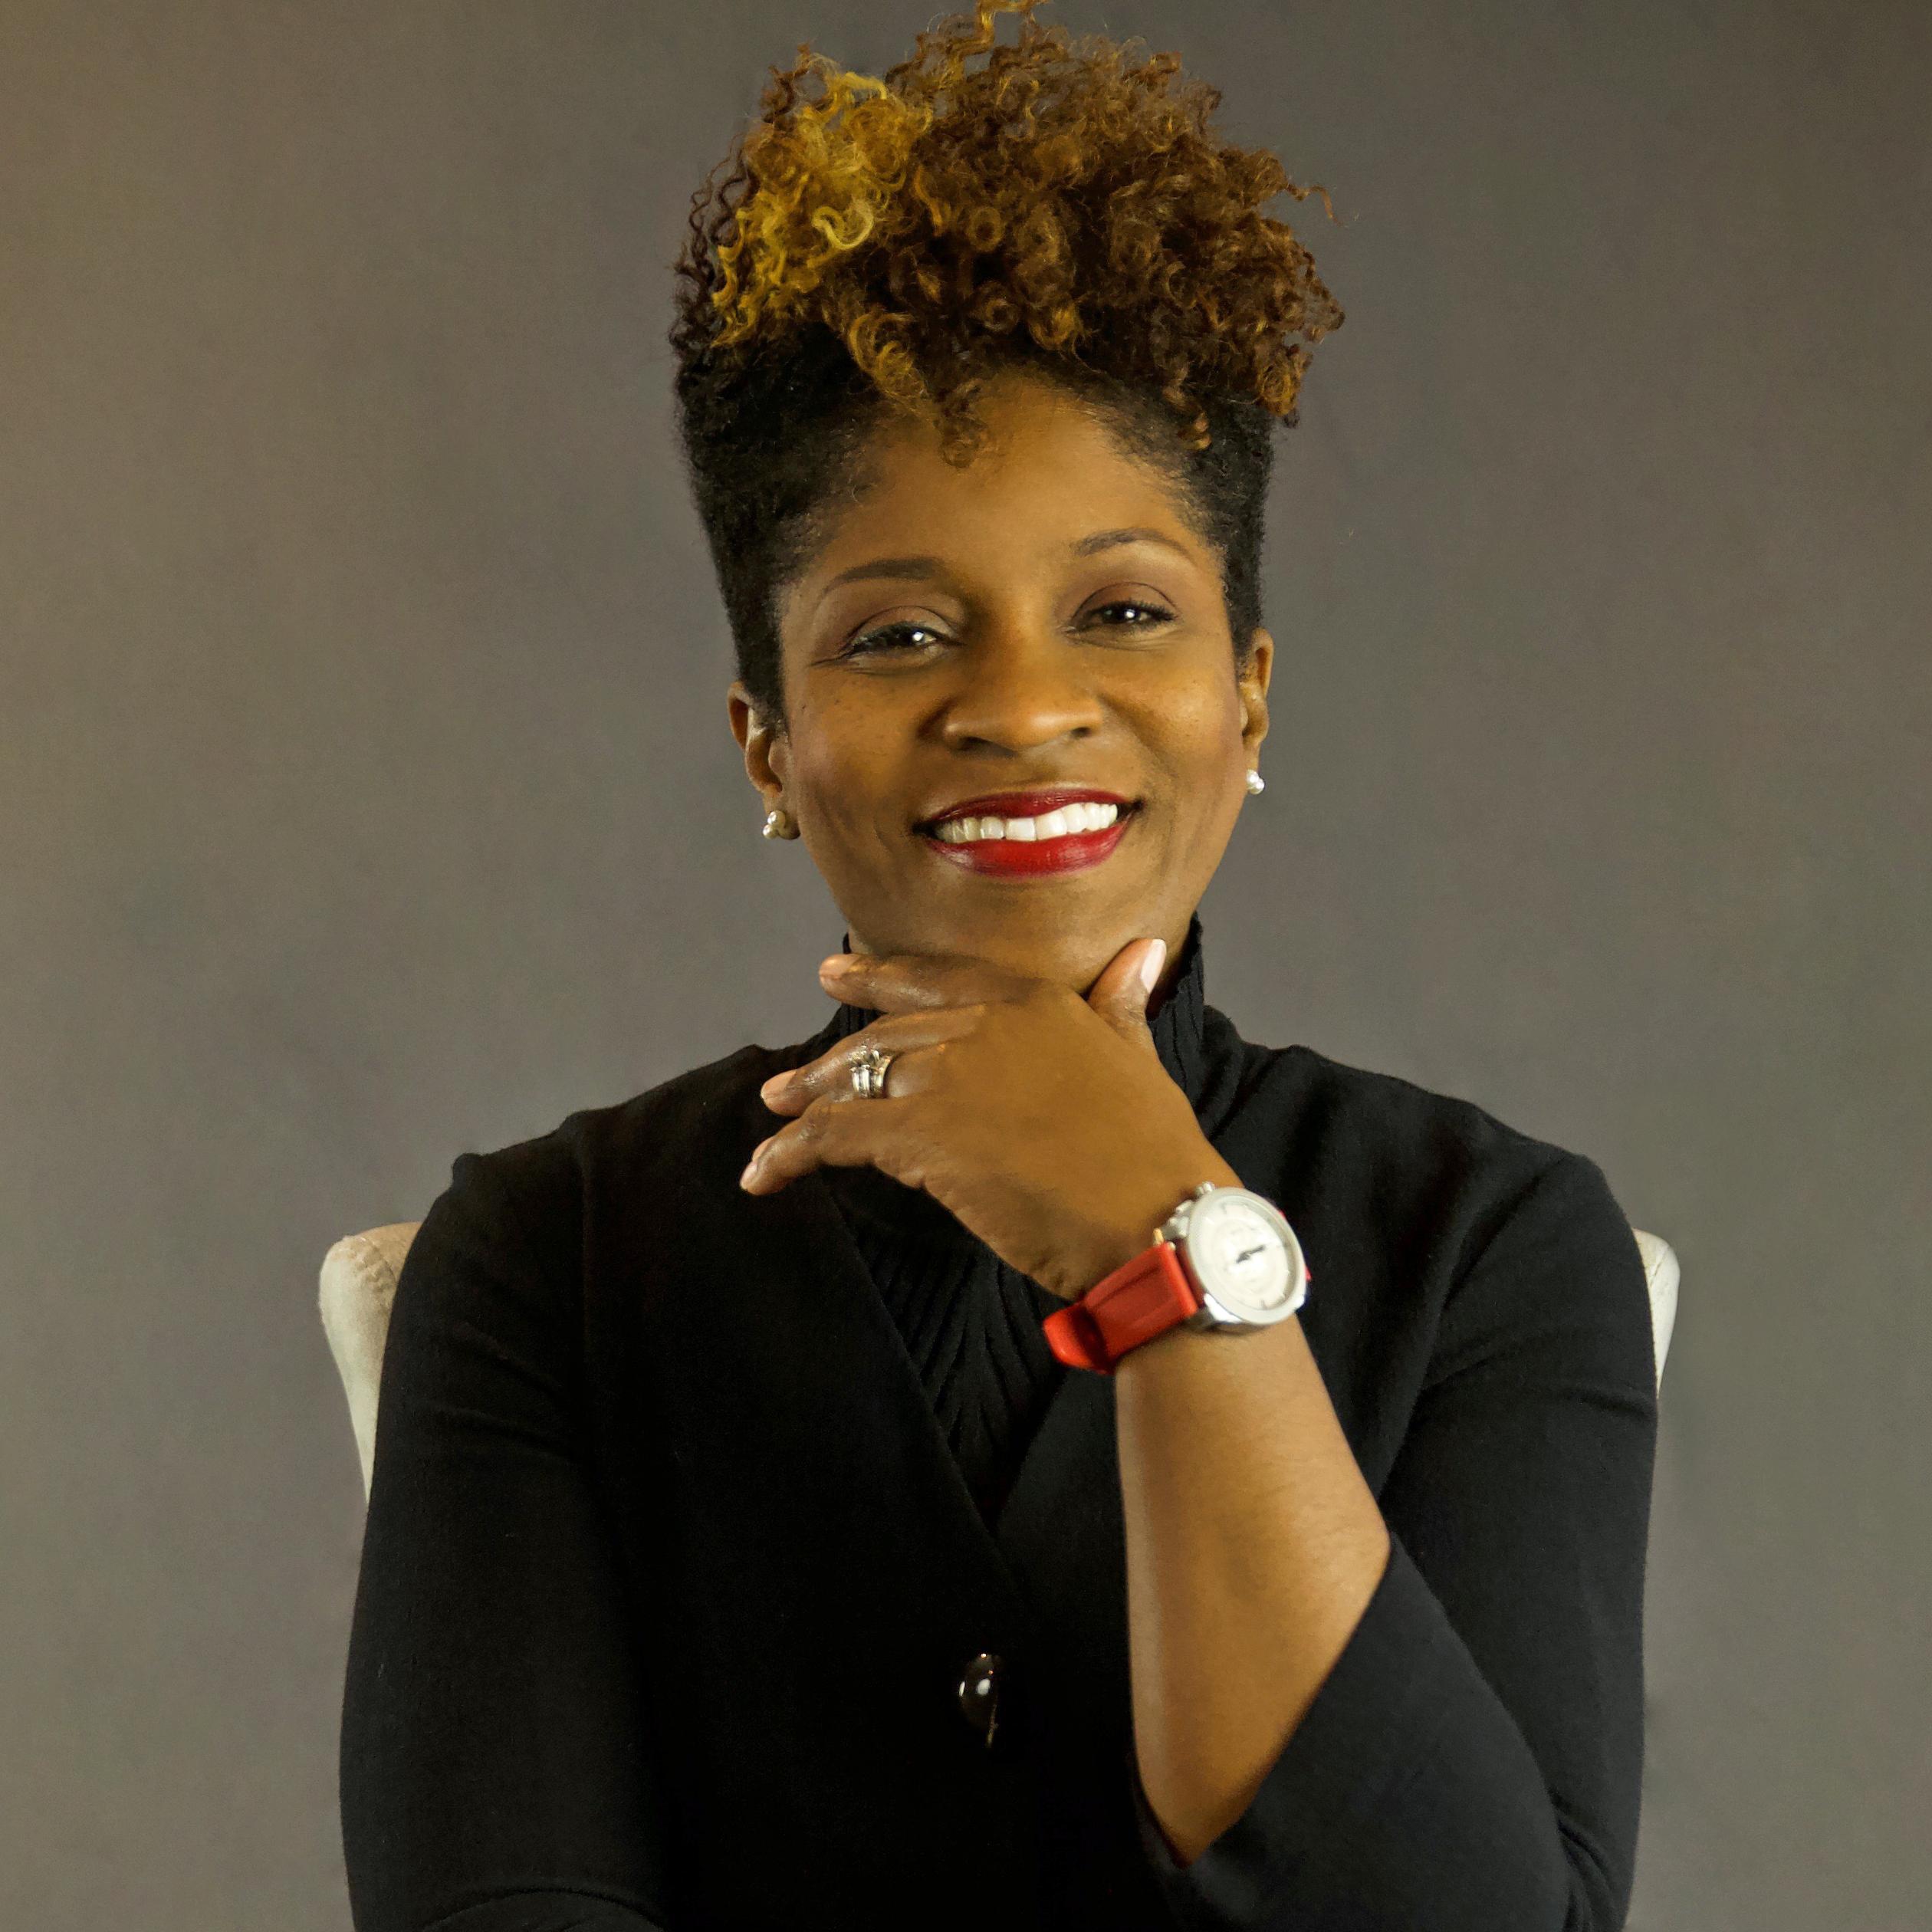 Dr. Cynthia Turner